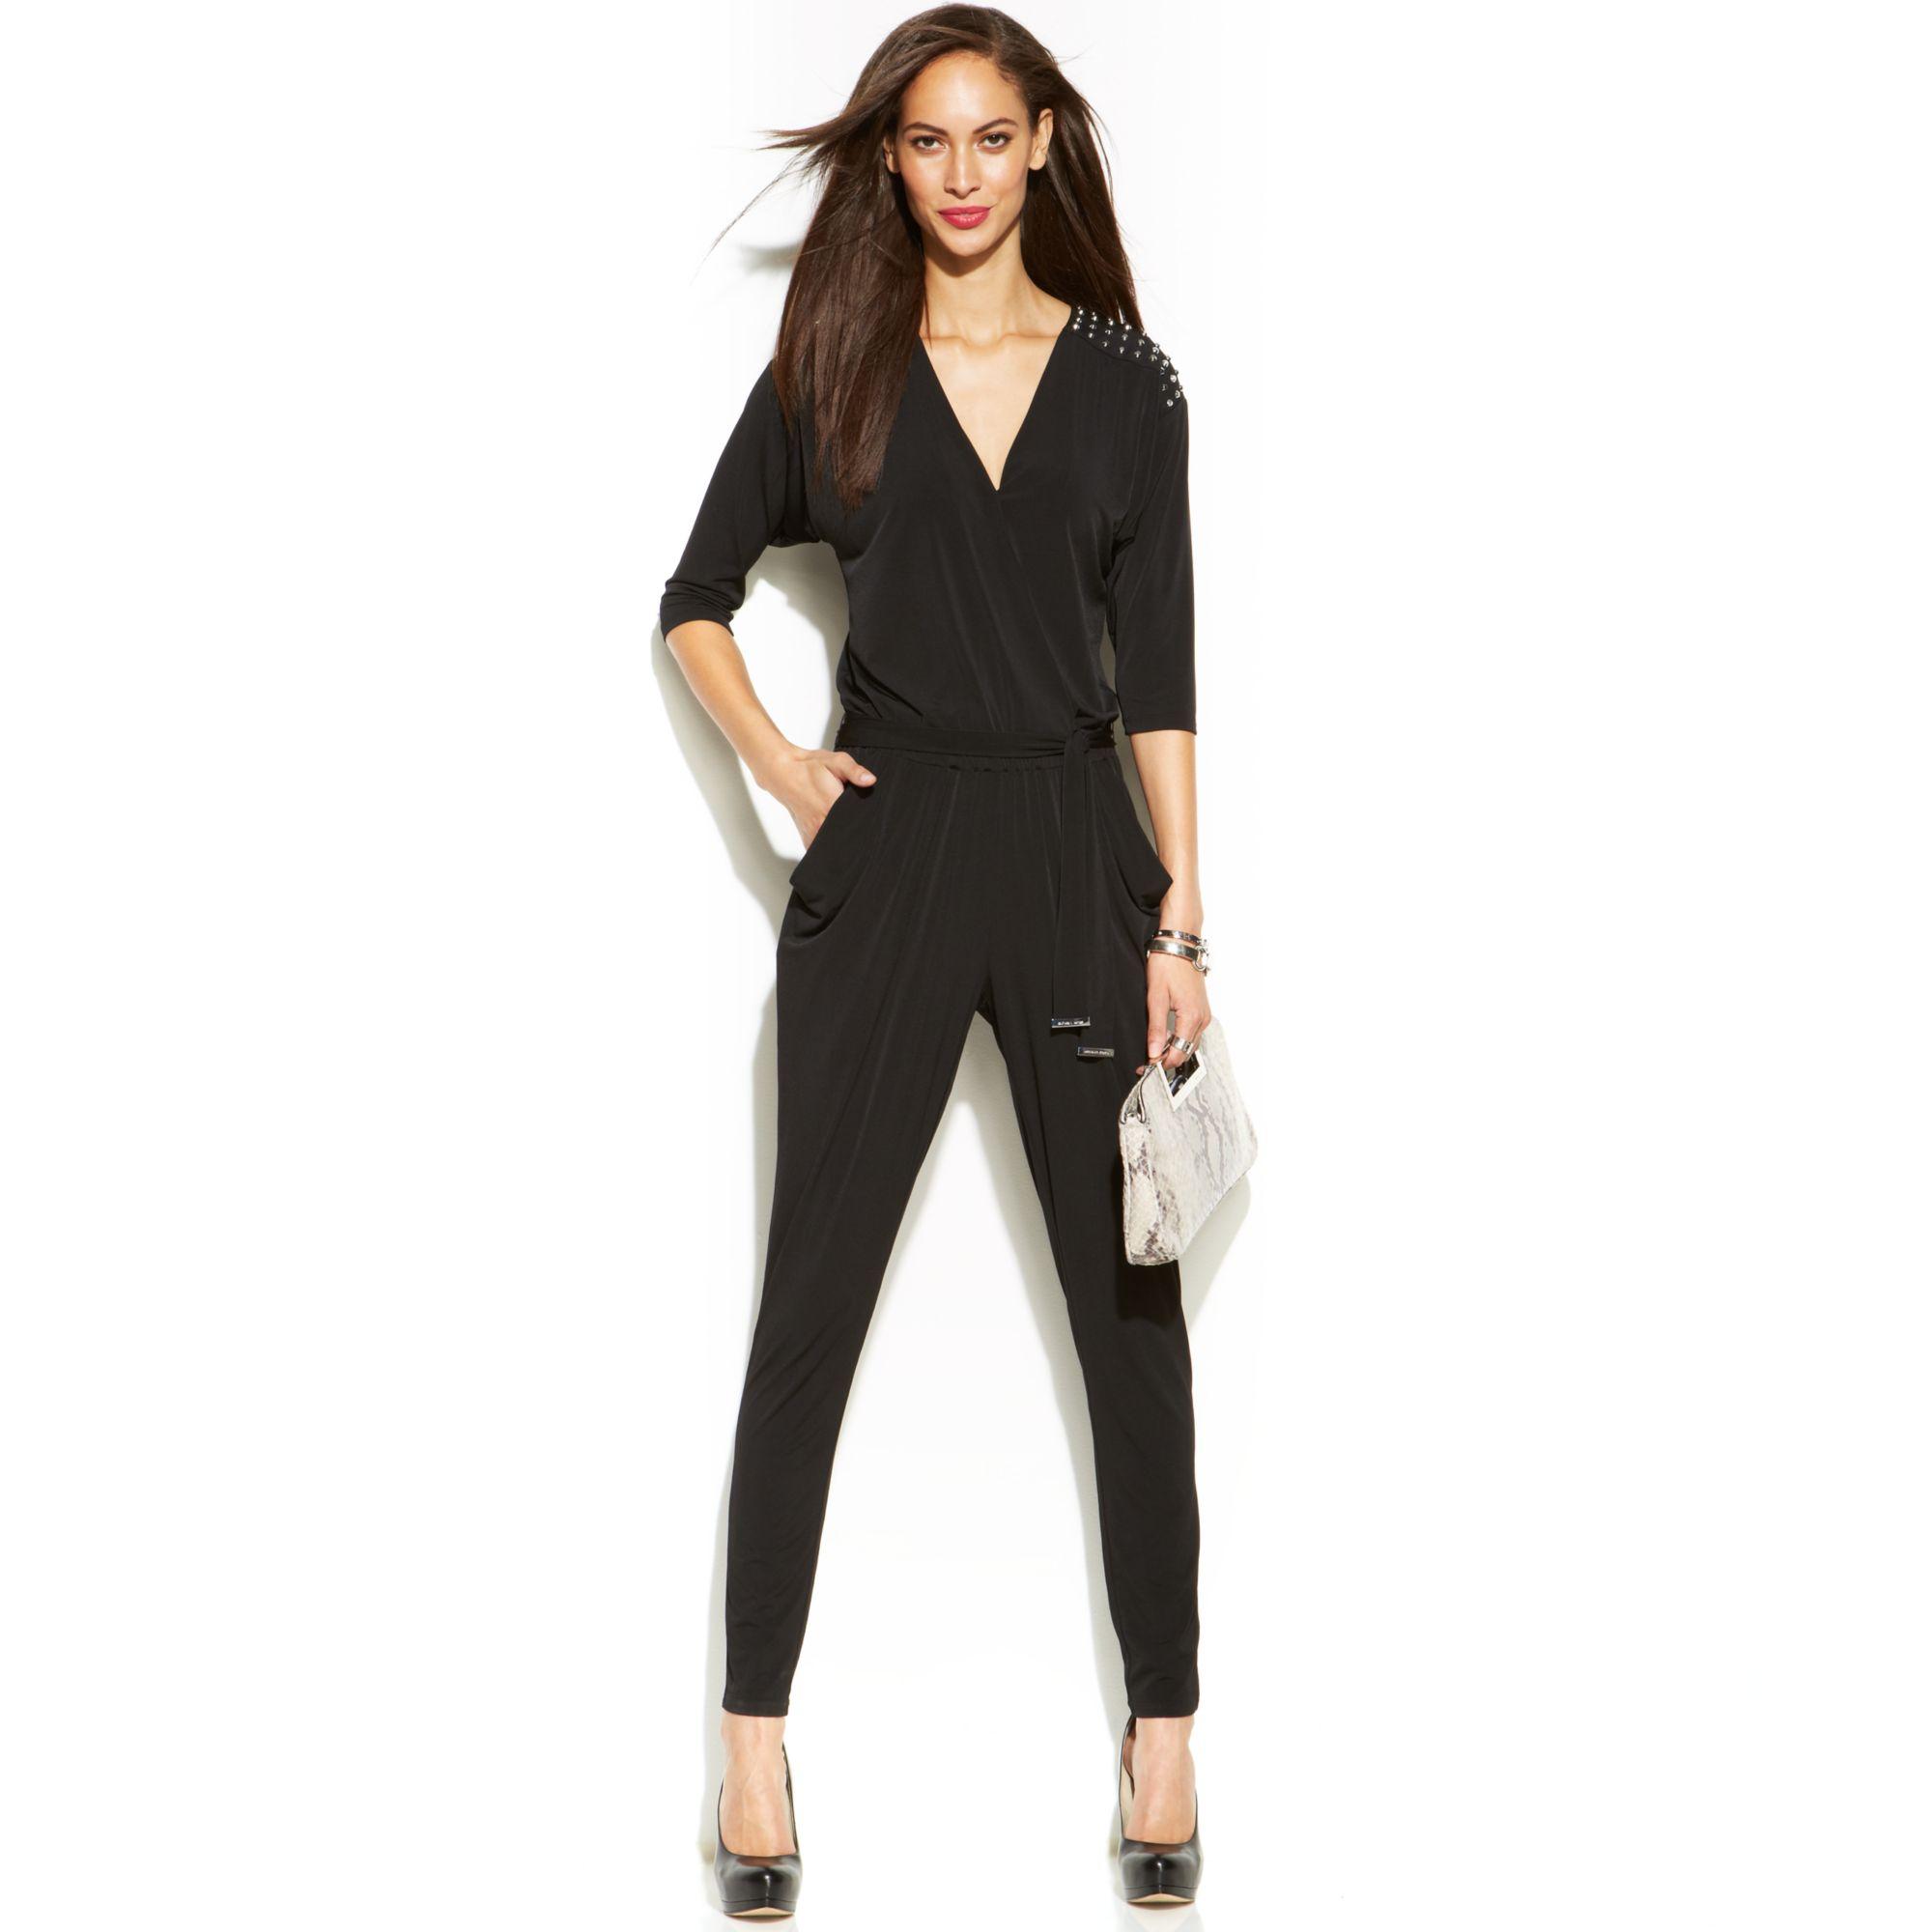 c25993808f0 Lyst - Michael Kors Michael Slimleg Studded Jumpsuit in Black